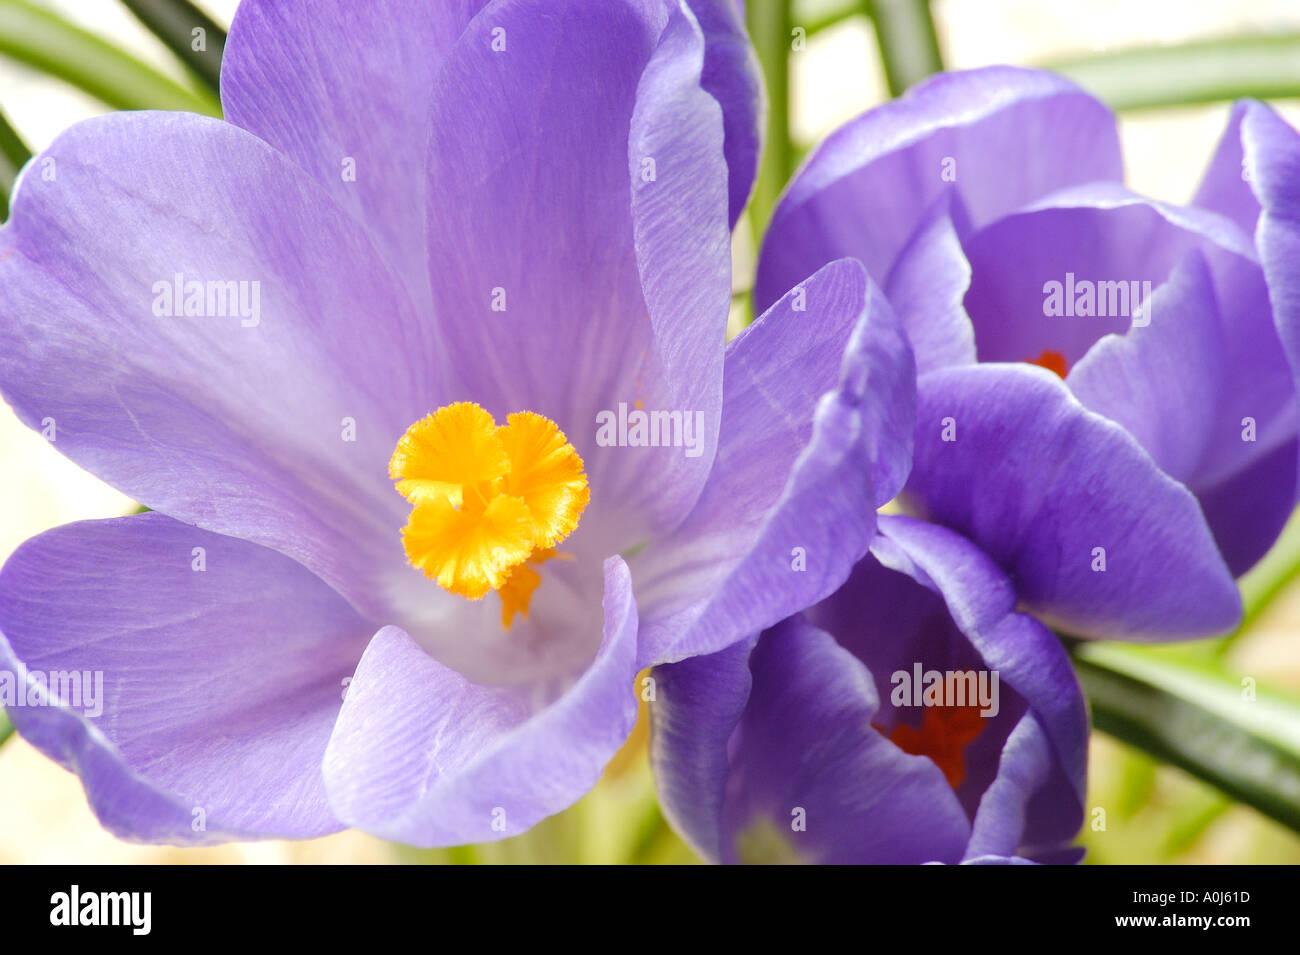 Crocus flower - Stock Image